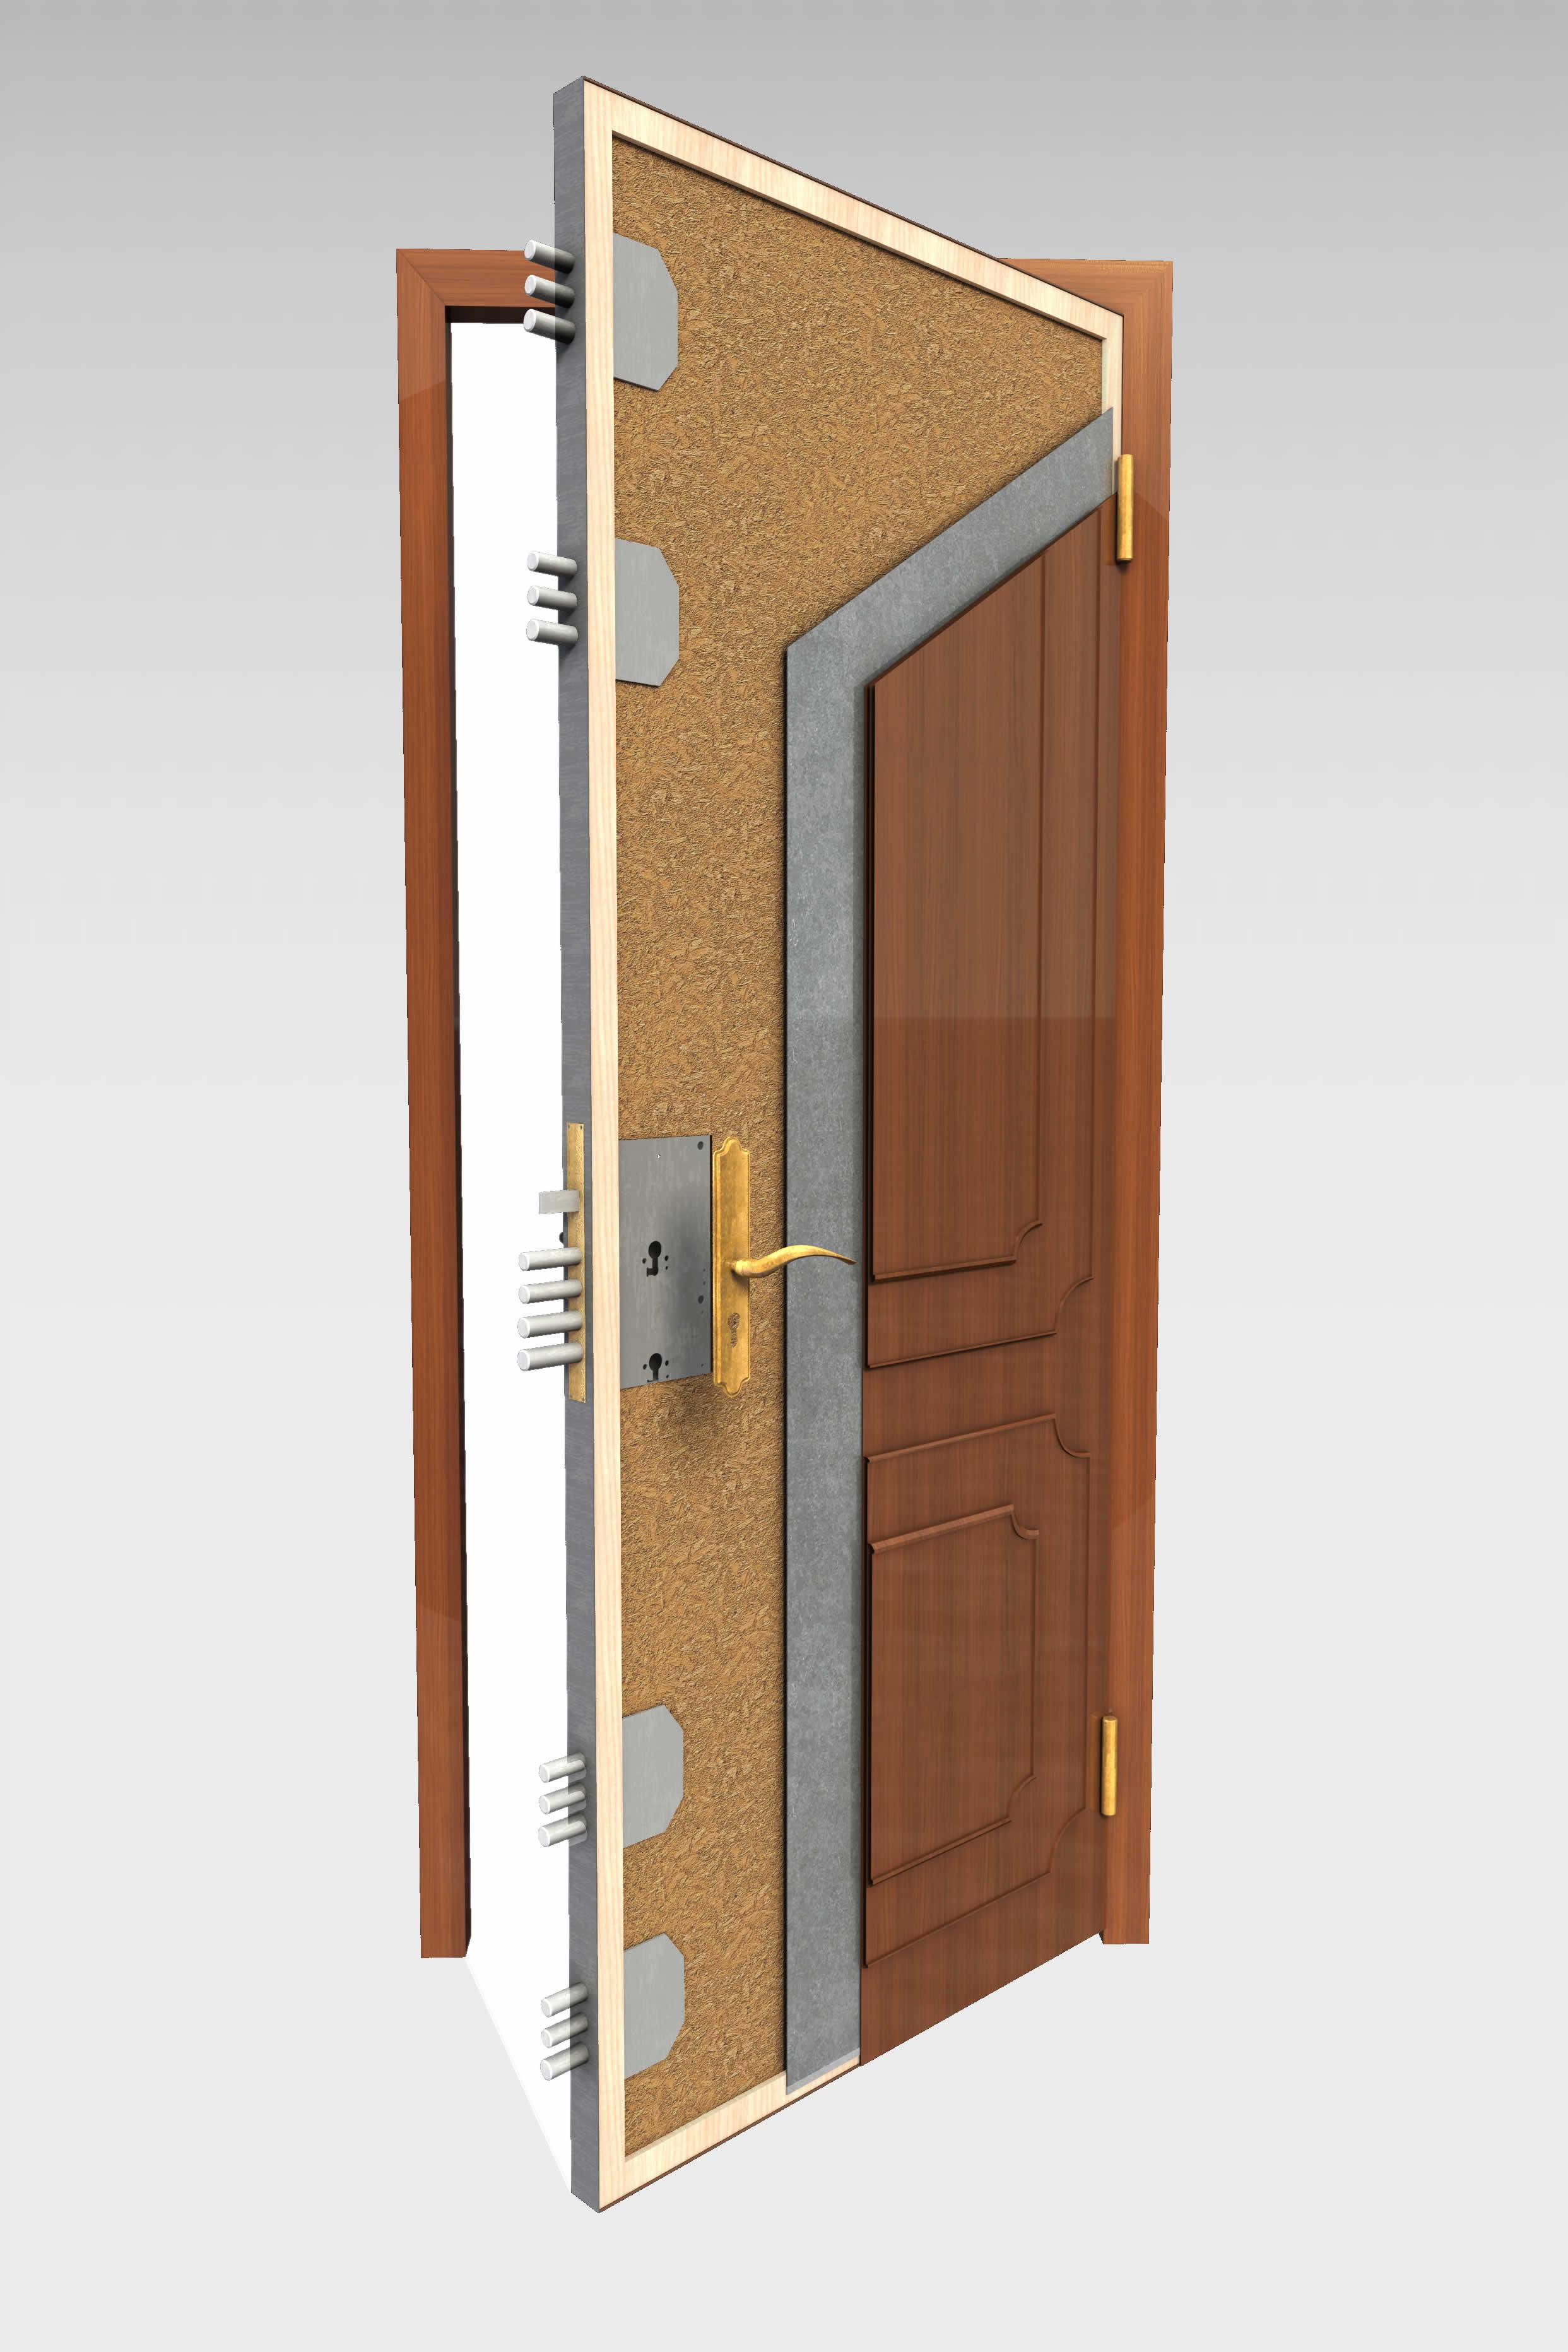 Puerta blindada b 16 serie t cnica roconsa - Puertas blindadas a medida ...